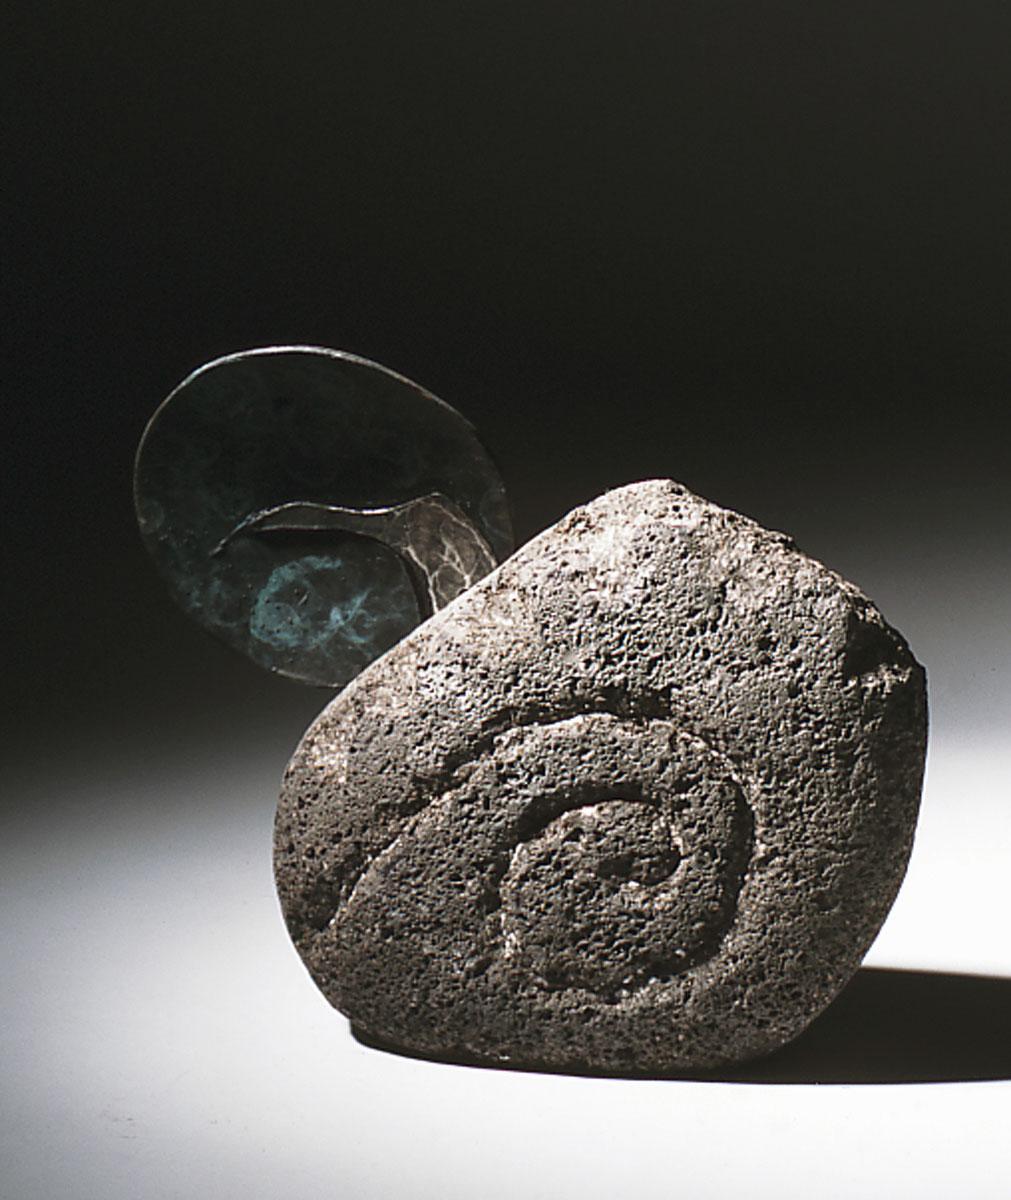 Set in Stone - Espiral